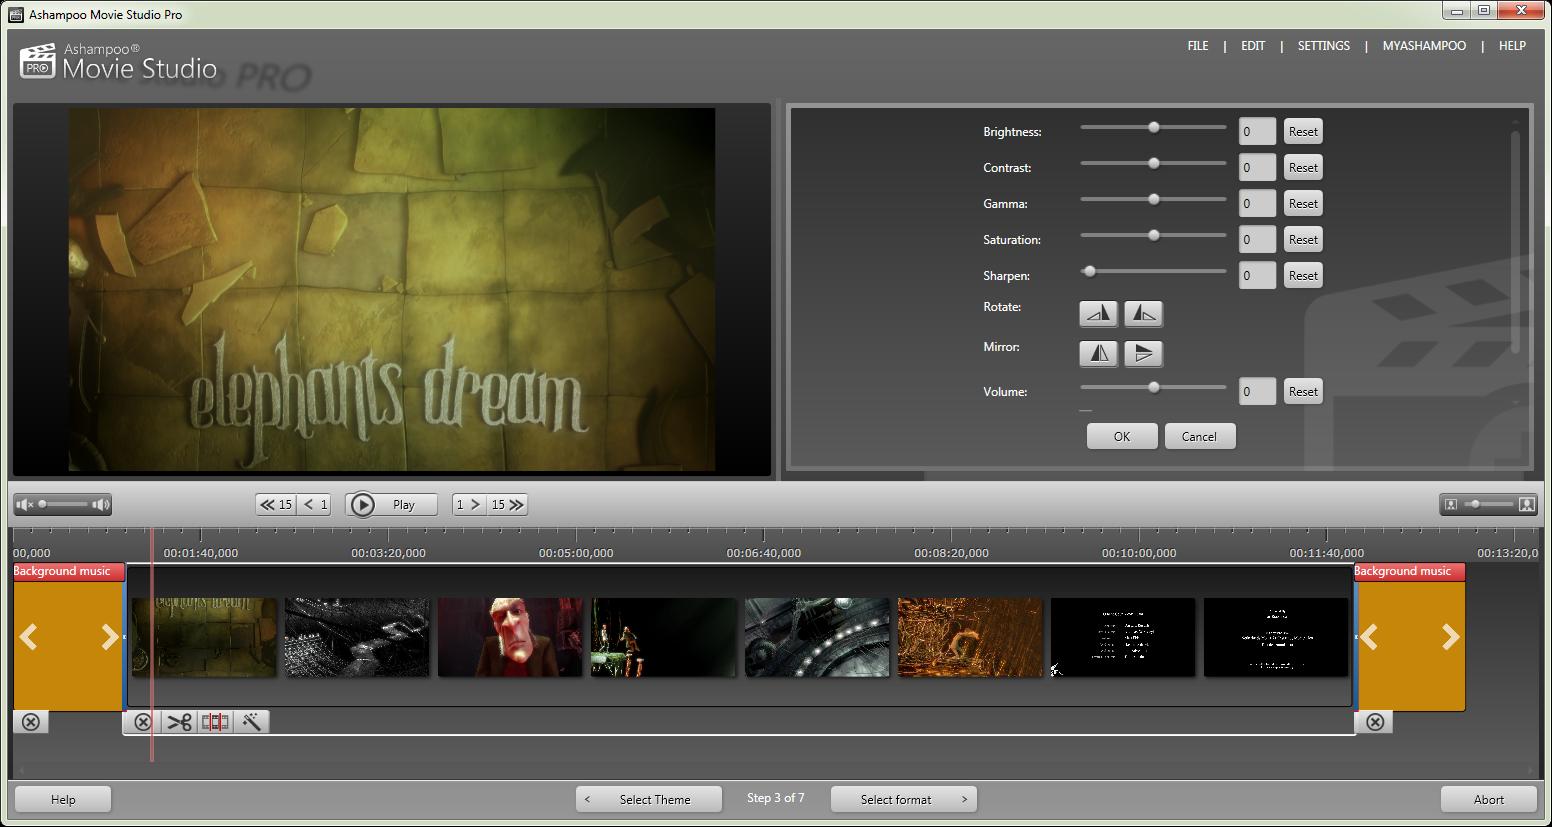 Ashampoo Movie Studio Pro,Ashampoo Movie Studio